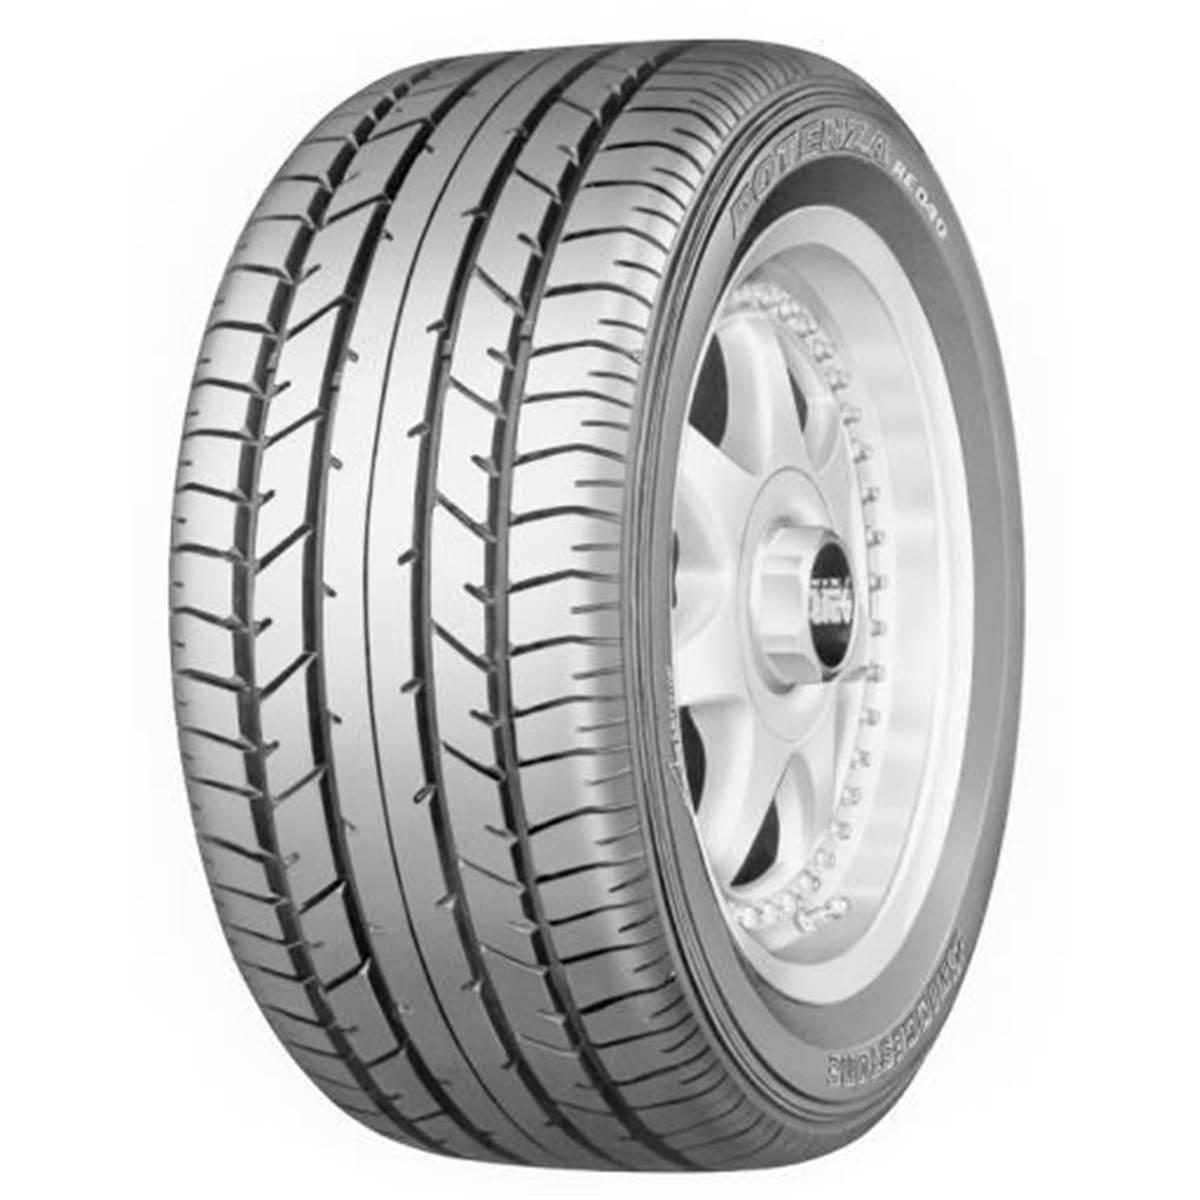 Pneu Bridgestone 165/50R15 73V Potenza Re040